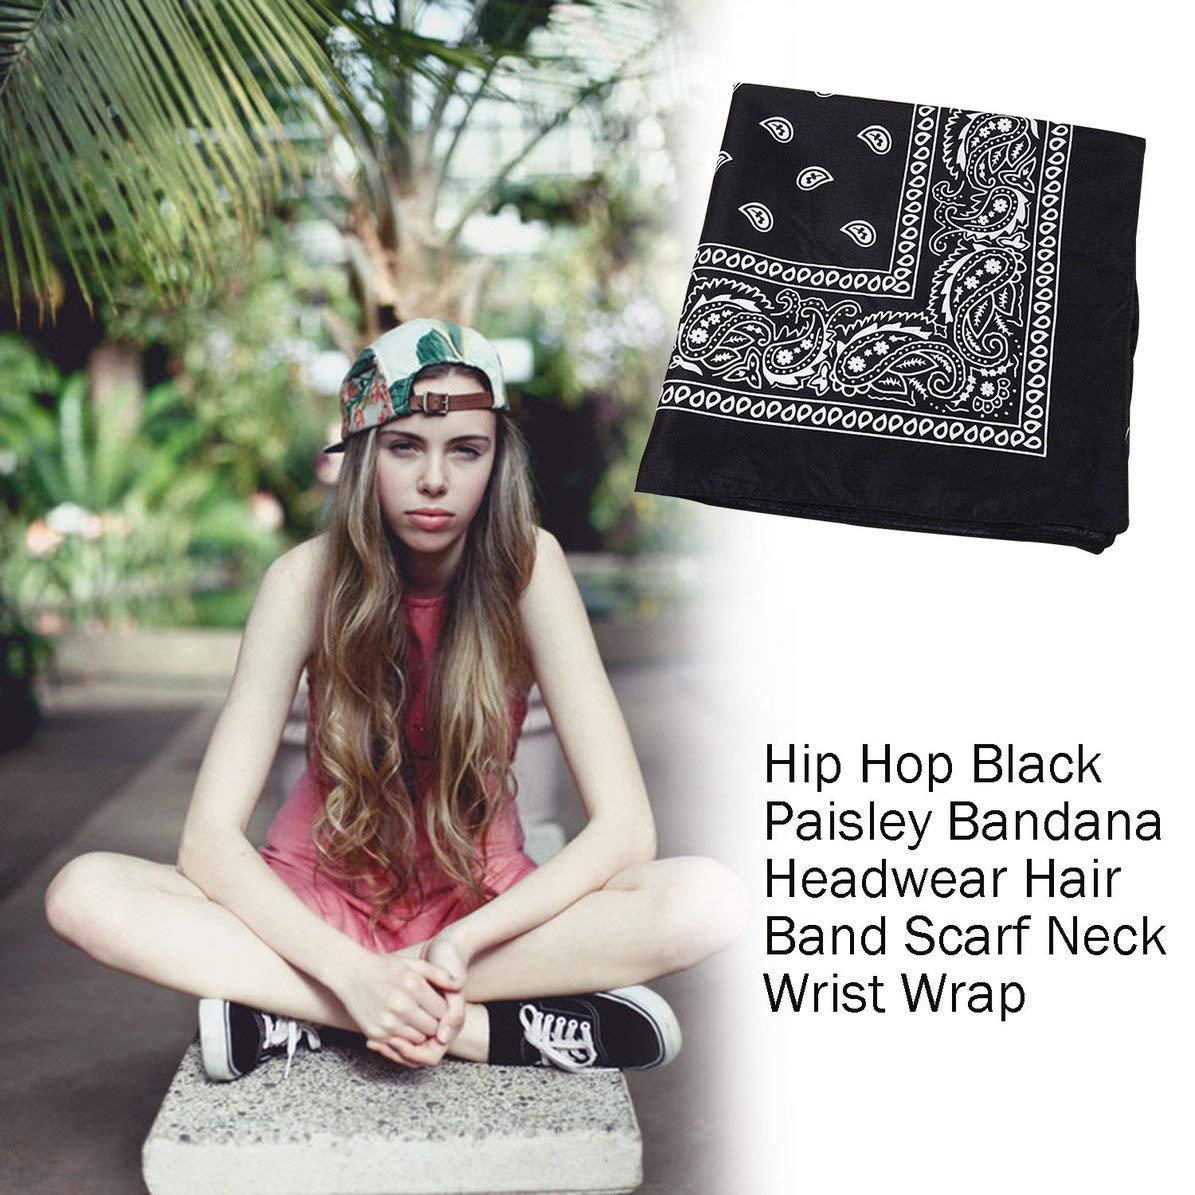 Corneliaa 1 UNID Unisex Hip Hop Negro Paisley Bandana Headwear Banda para el Pelo Cuello de la mu/ñeca Mu/ñeca Wrap Band Headtie Bufanda Cuadrada